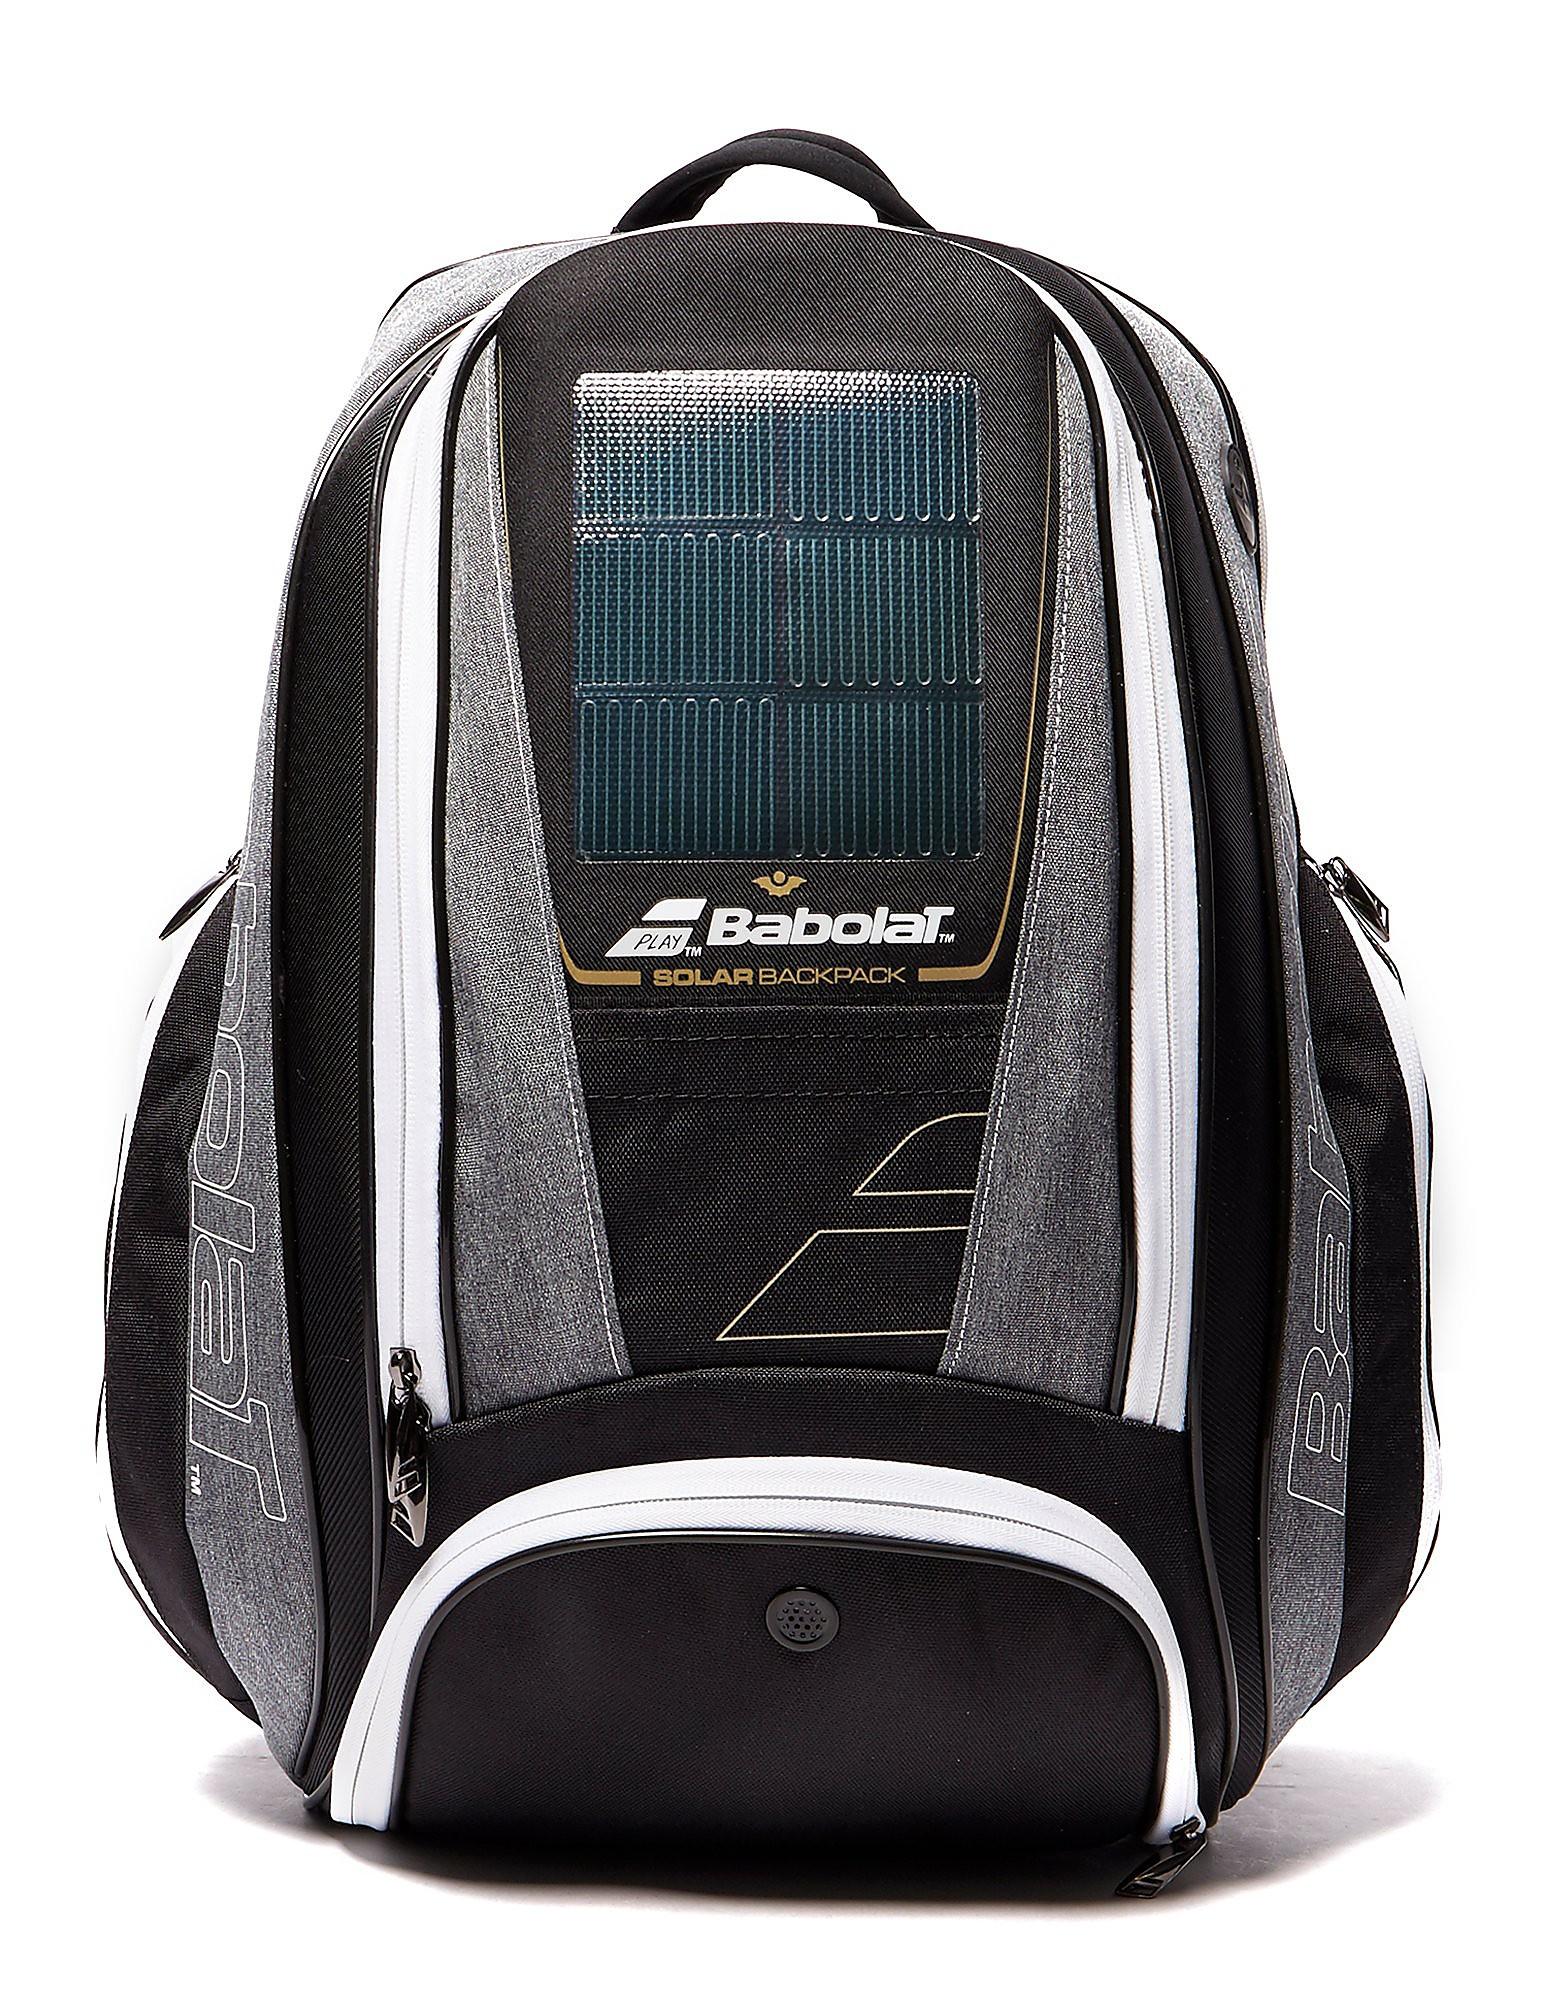 Babolat Solar Backpack